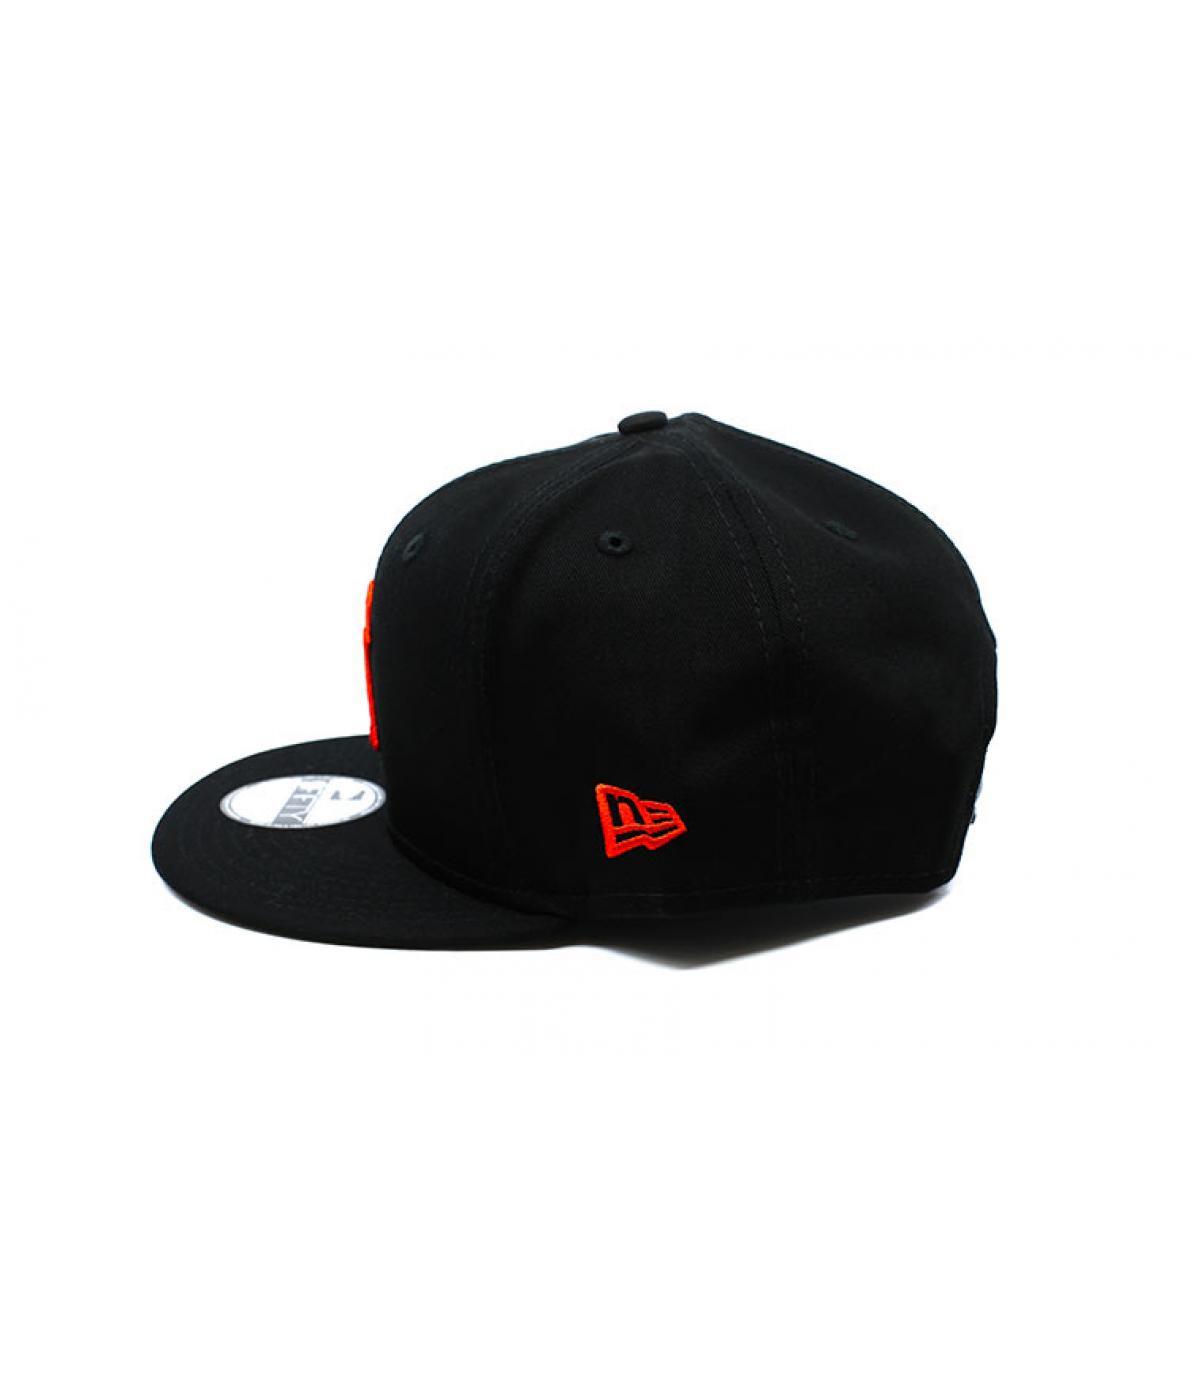 Details League Ess NY 9Fifty black orange - afbeeling 4